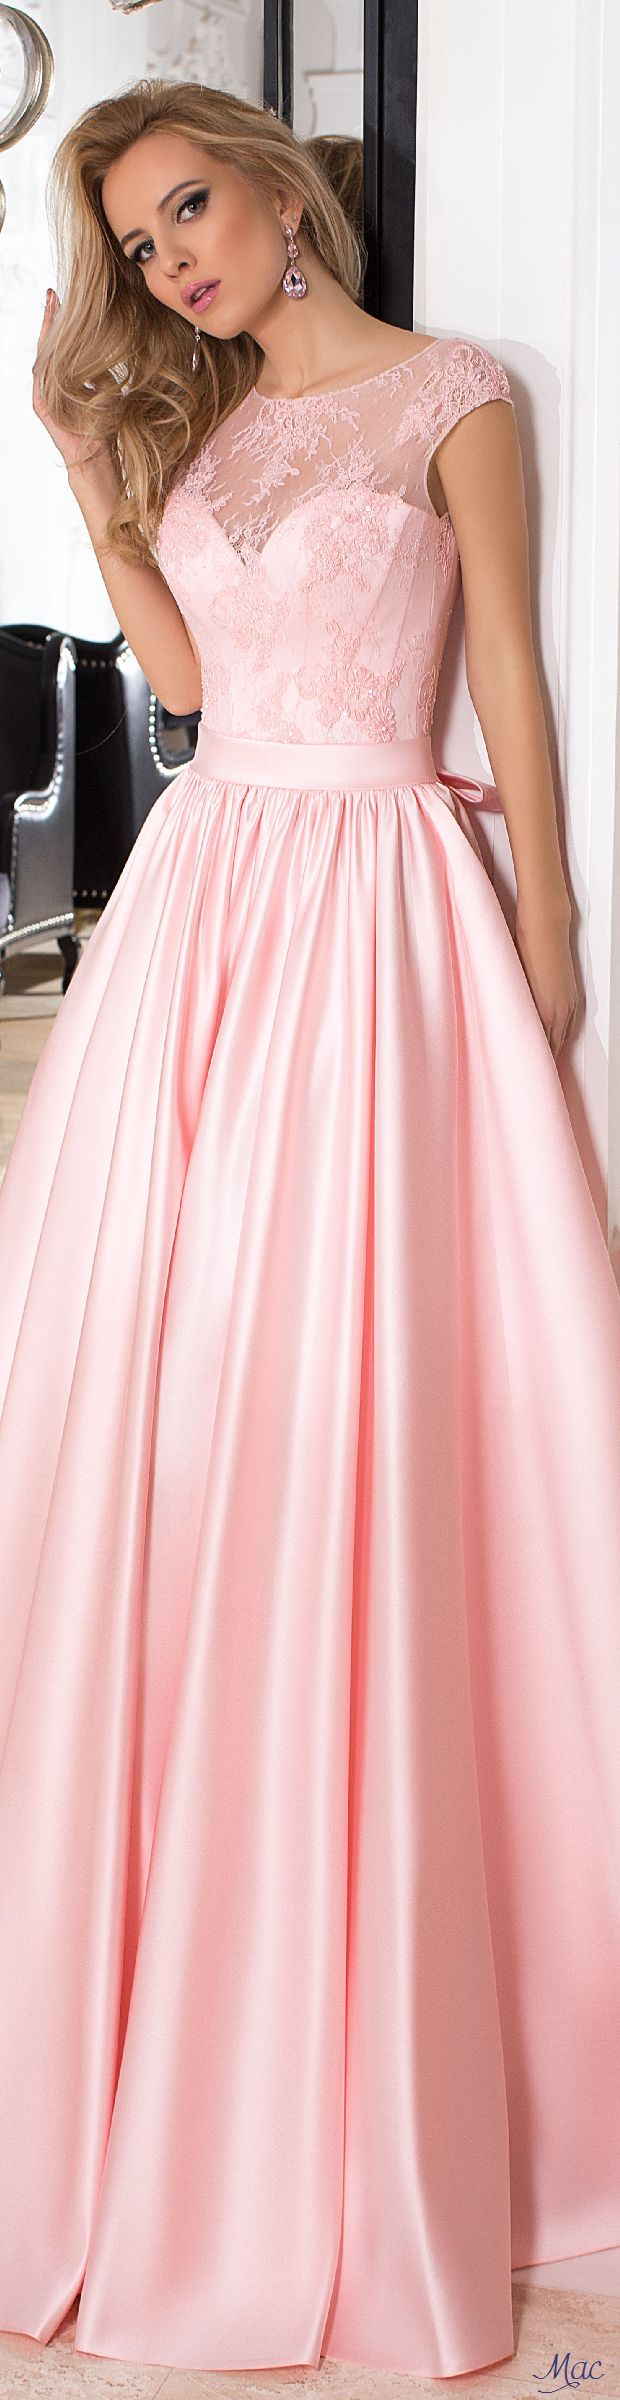 268 best Elegant ⚜ Pink images on Pinterest | Blush, Blushes and ...